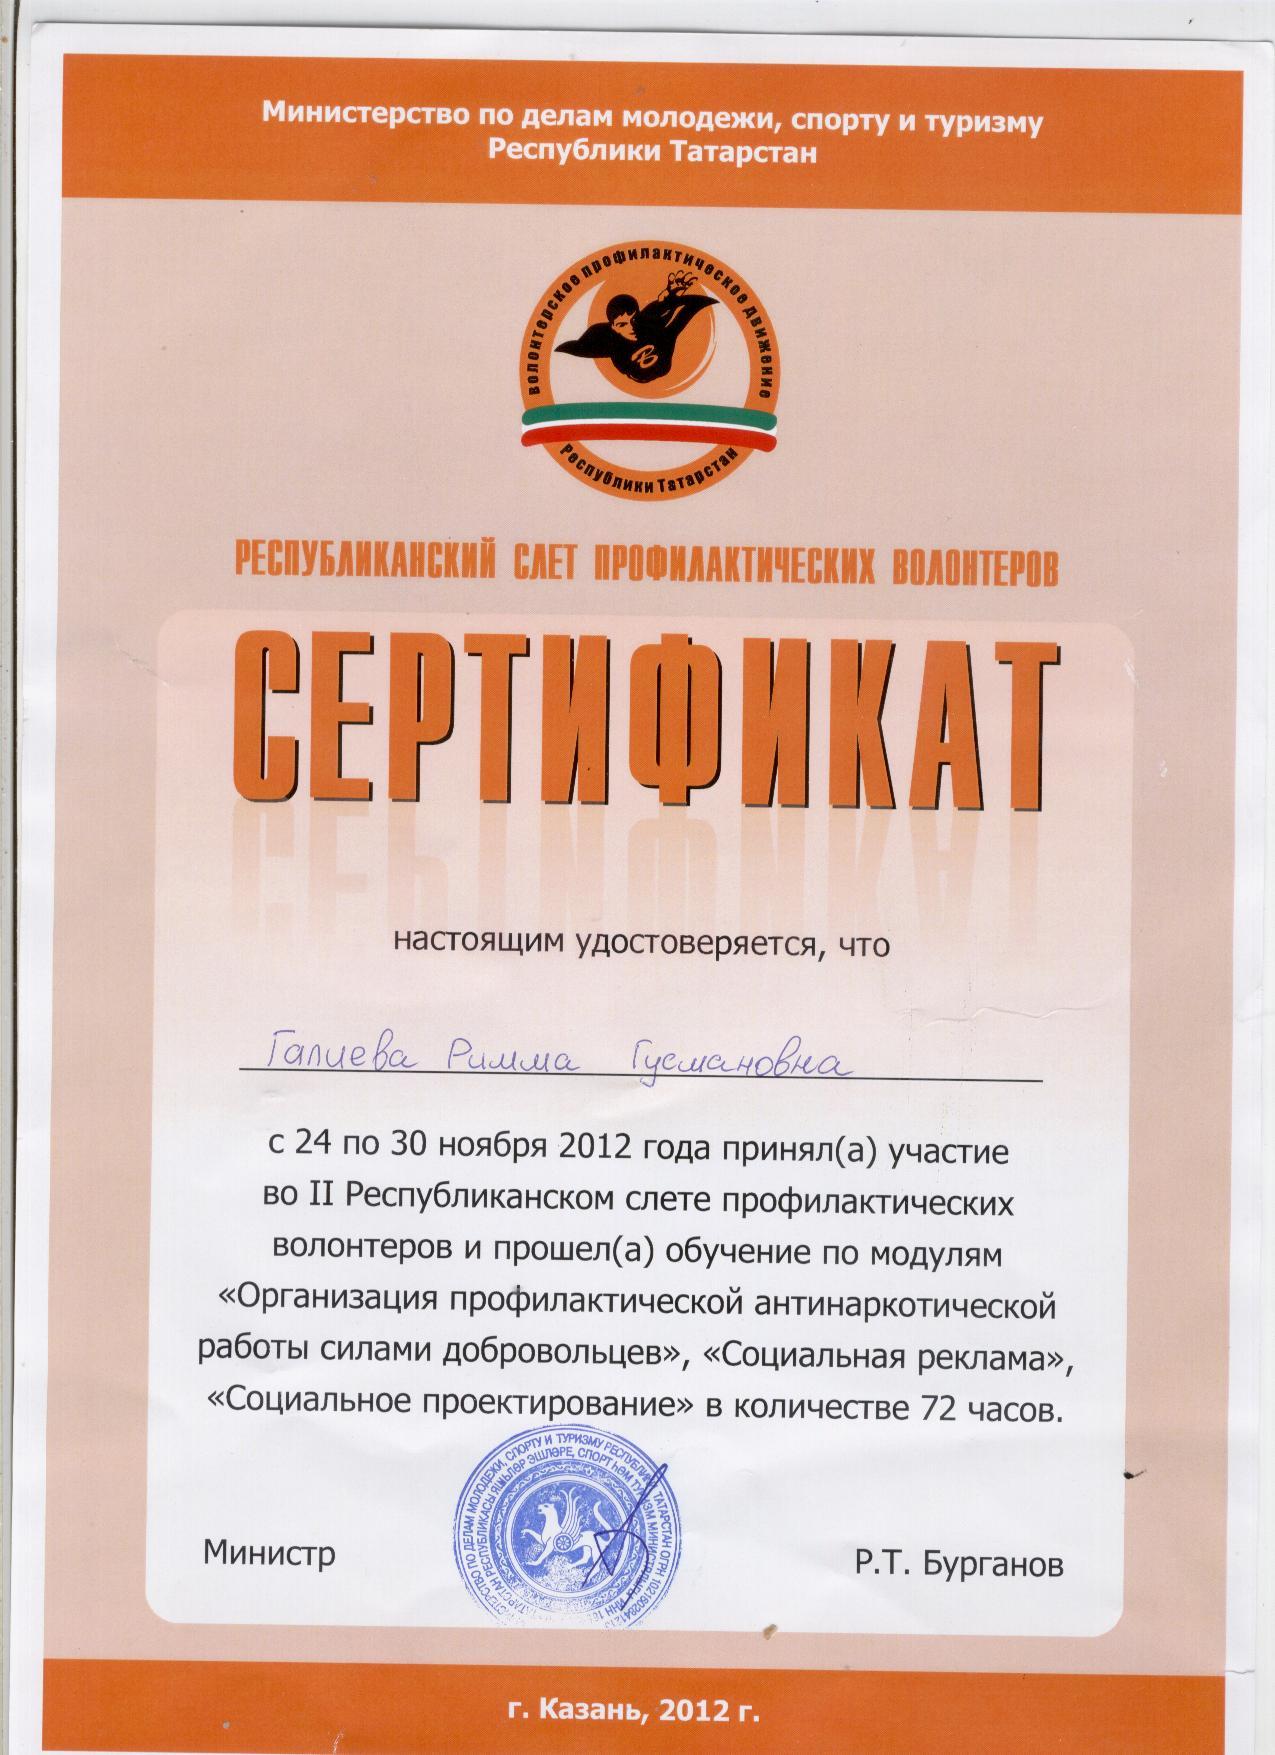 F:\Всероссйский конкурс Портфолио выпускника\РИММА\Римма 022.jpg